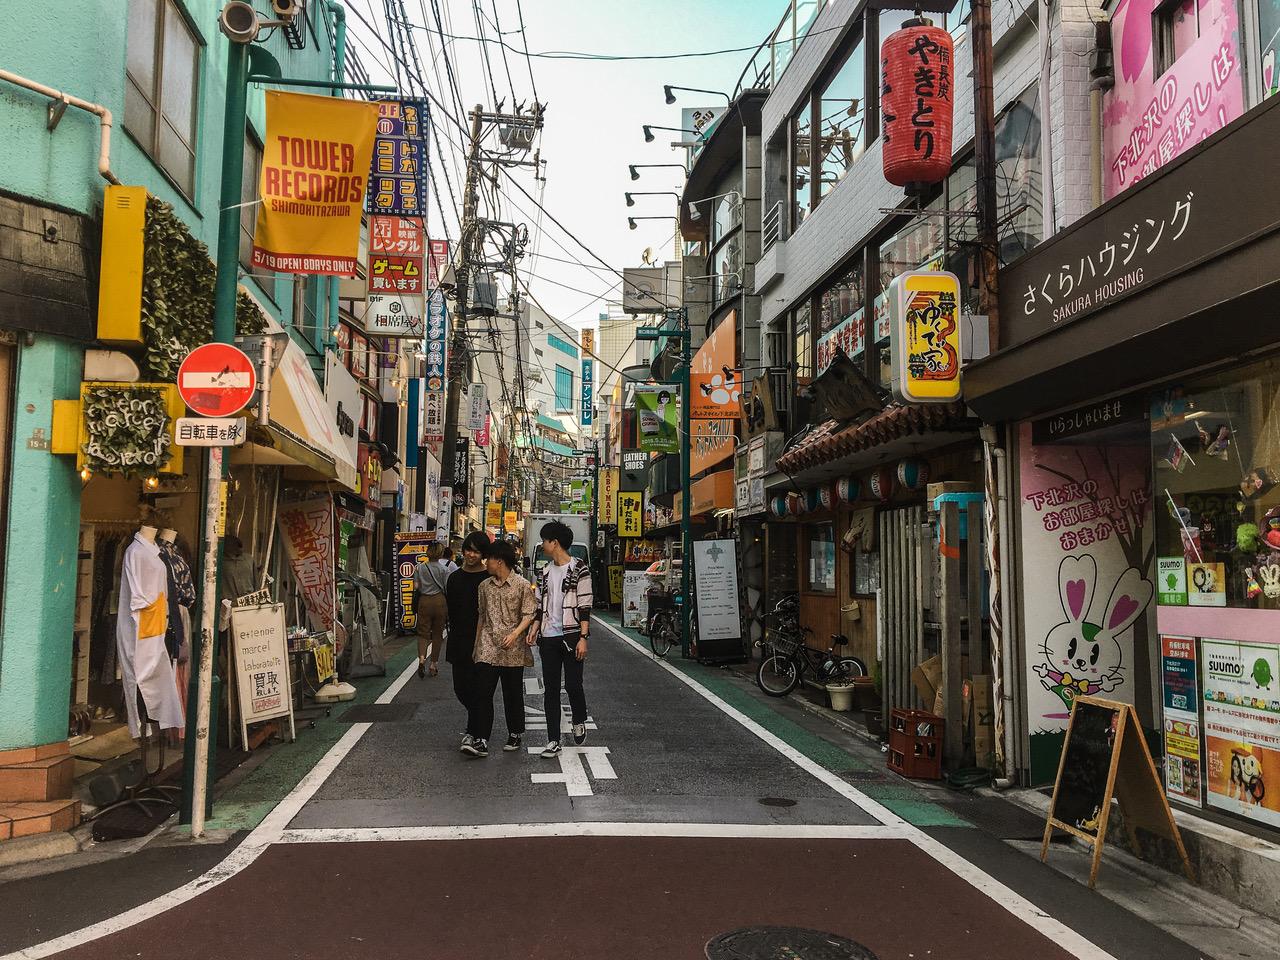 Visiter Tokyo et aller voir le quartier Shimo-kitazawa